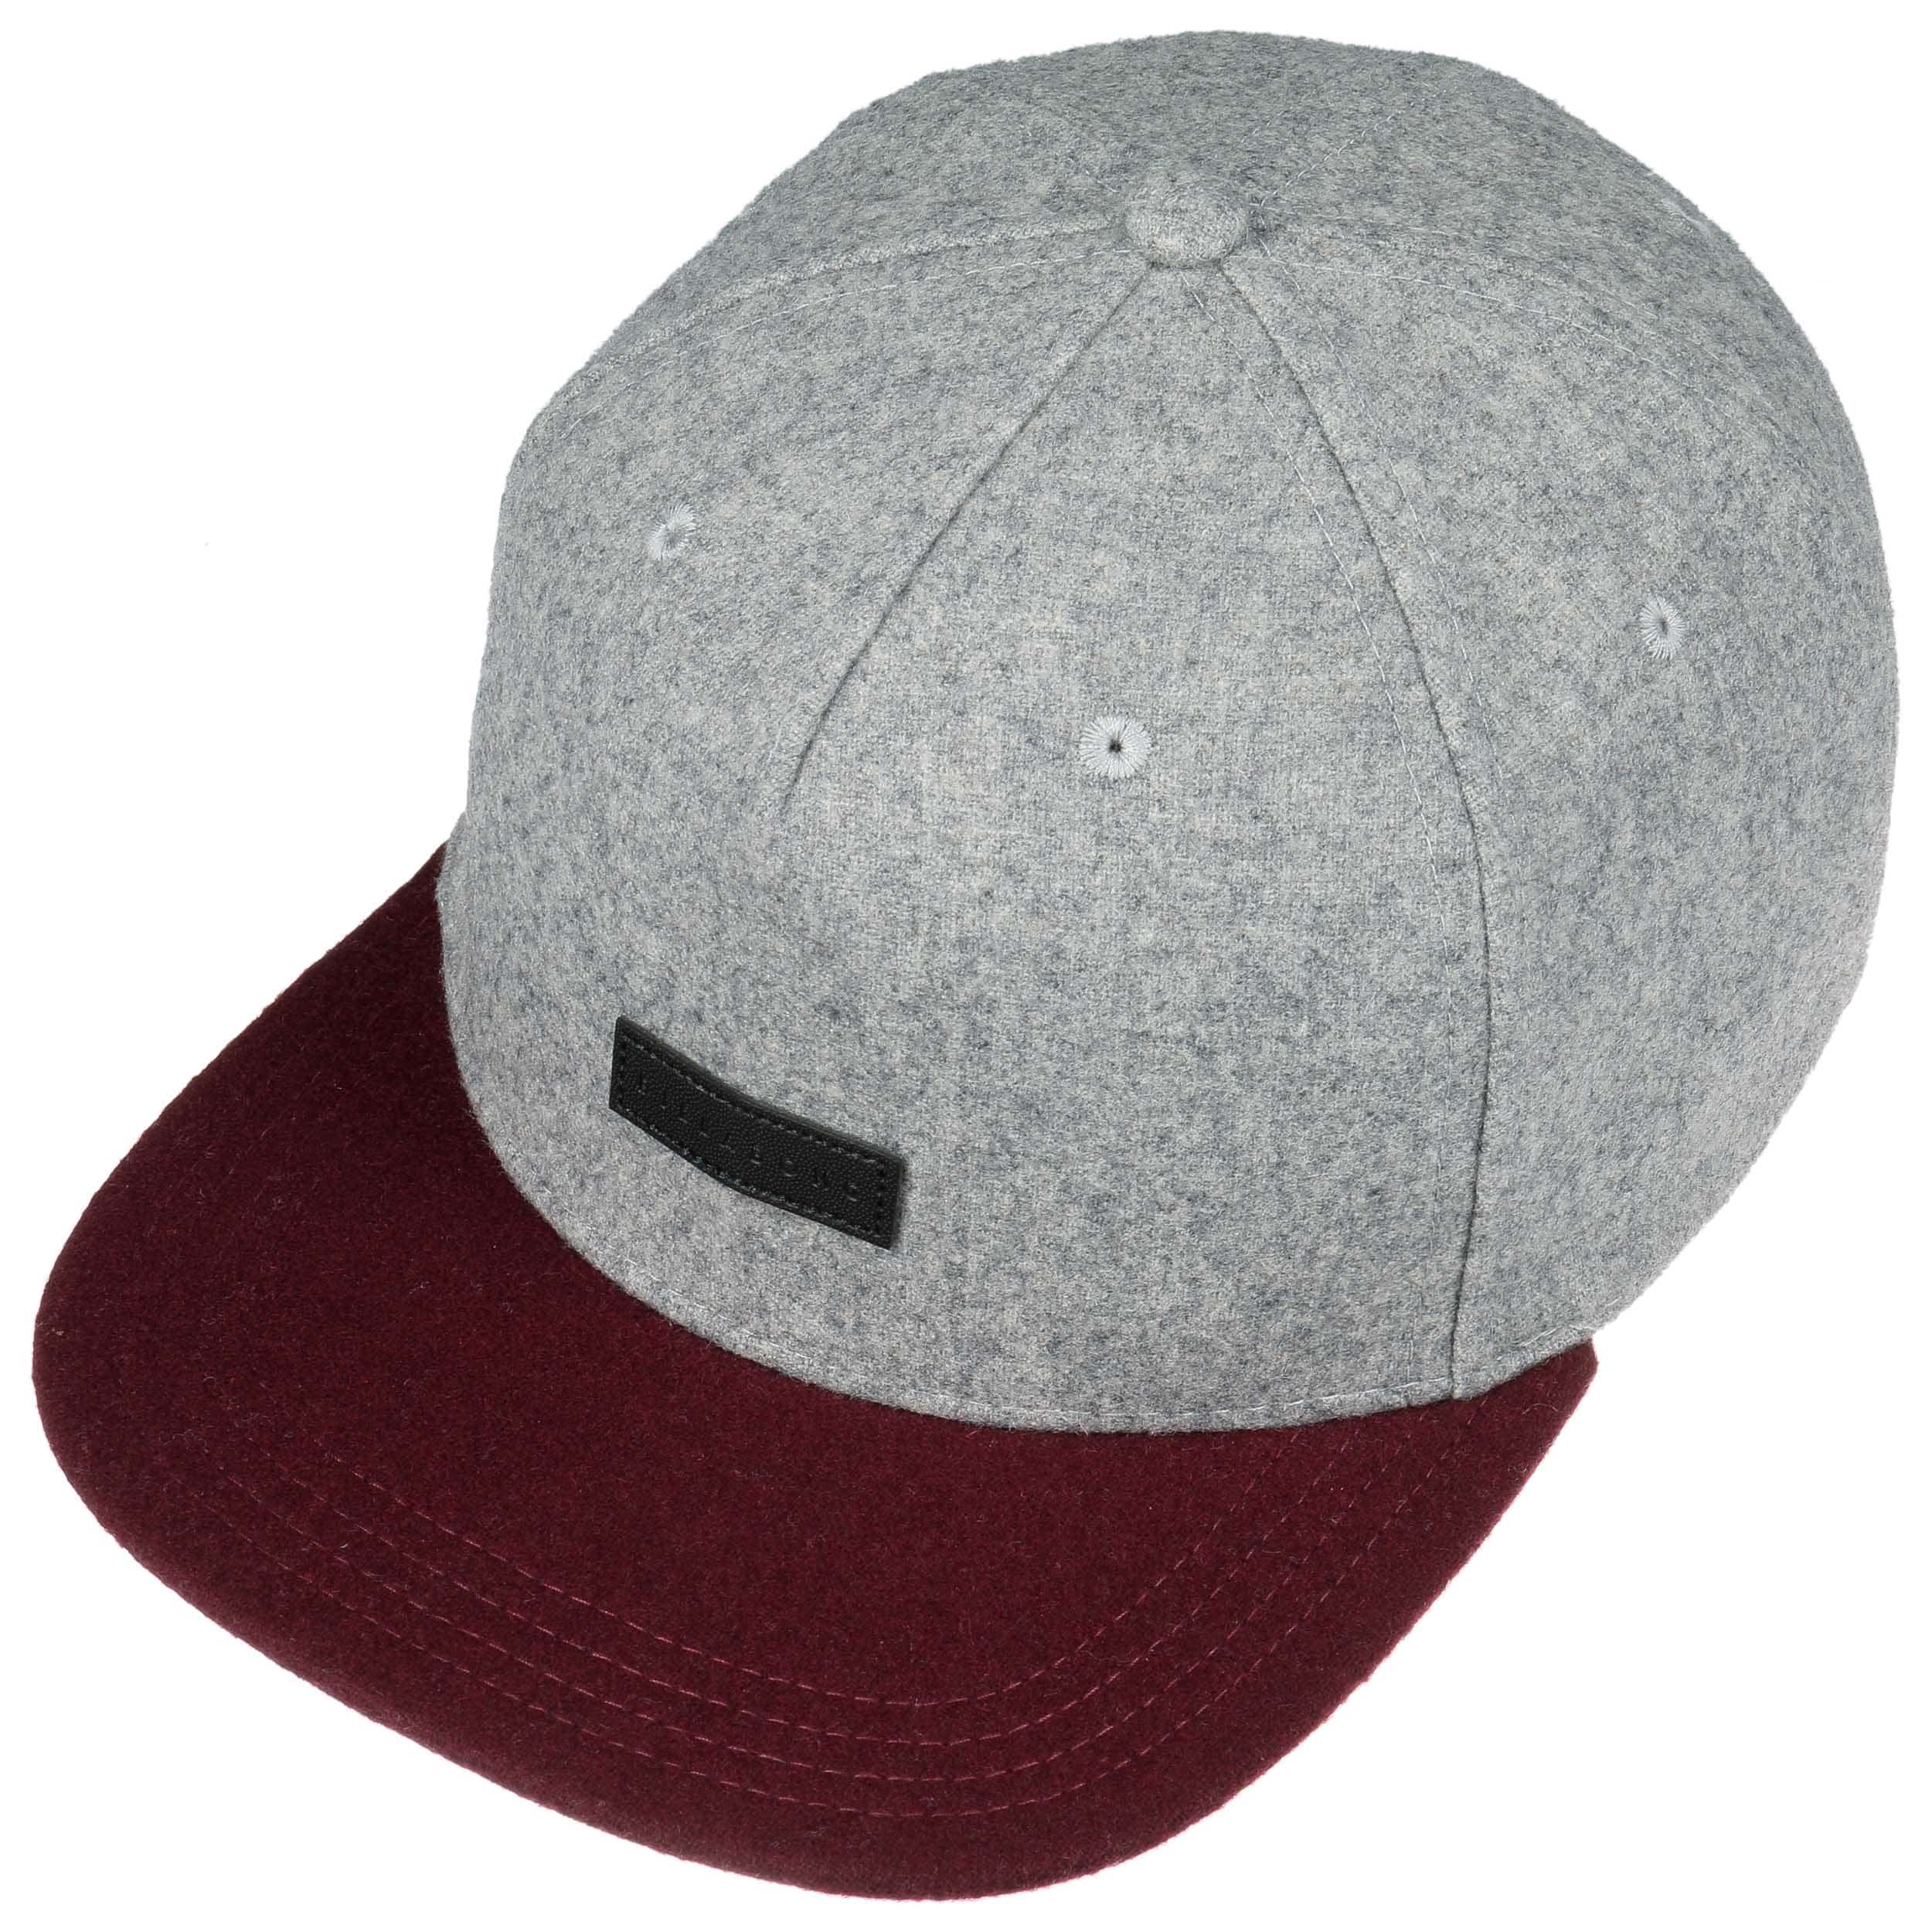 ... Oxford Snapback Cap by Billabong - silber 1 ... b43ca0b641dc